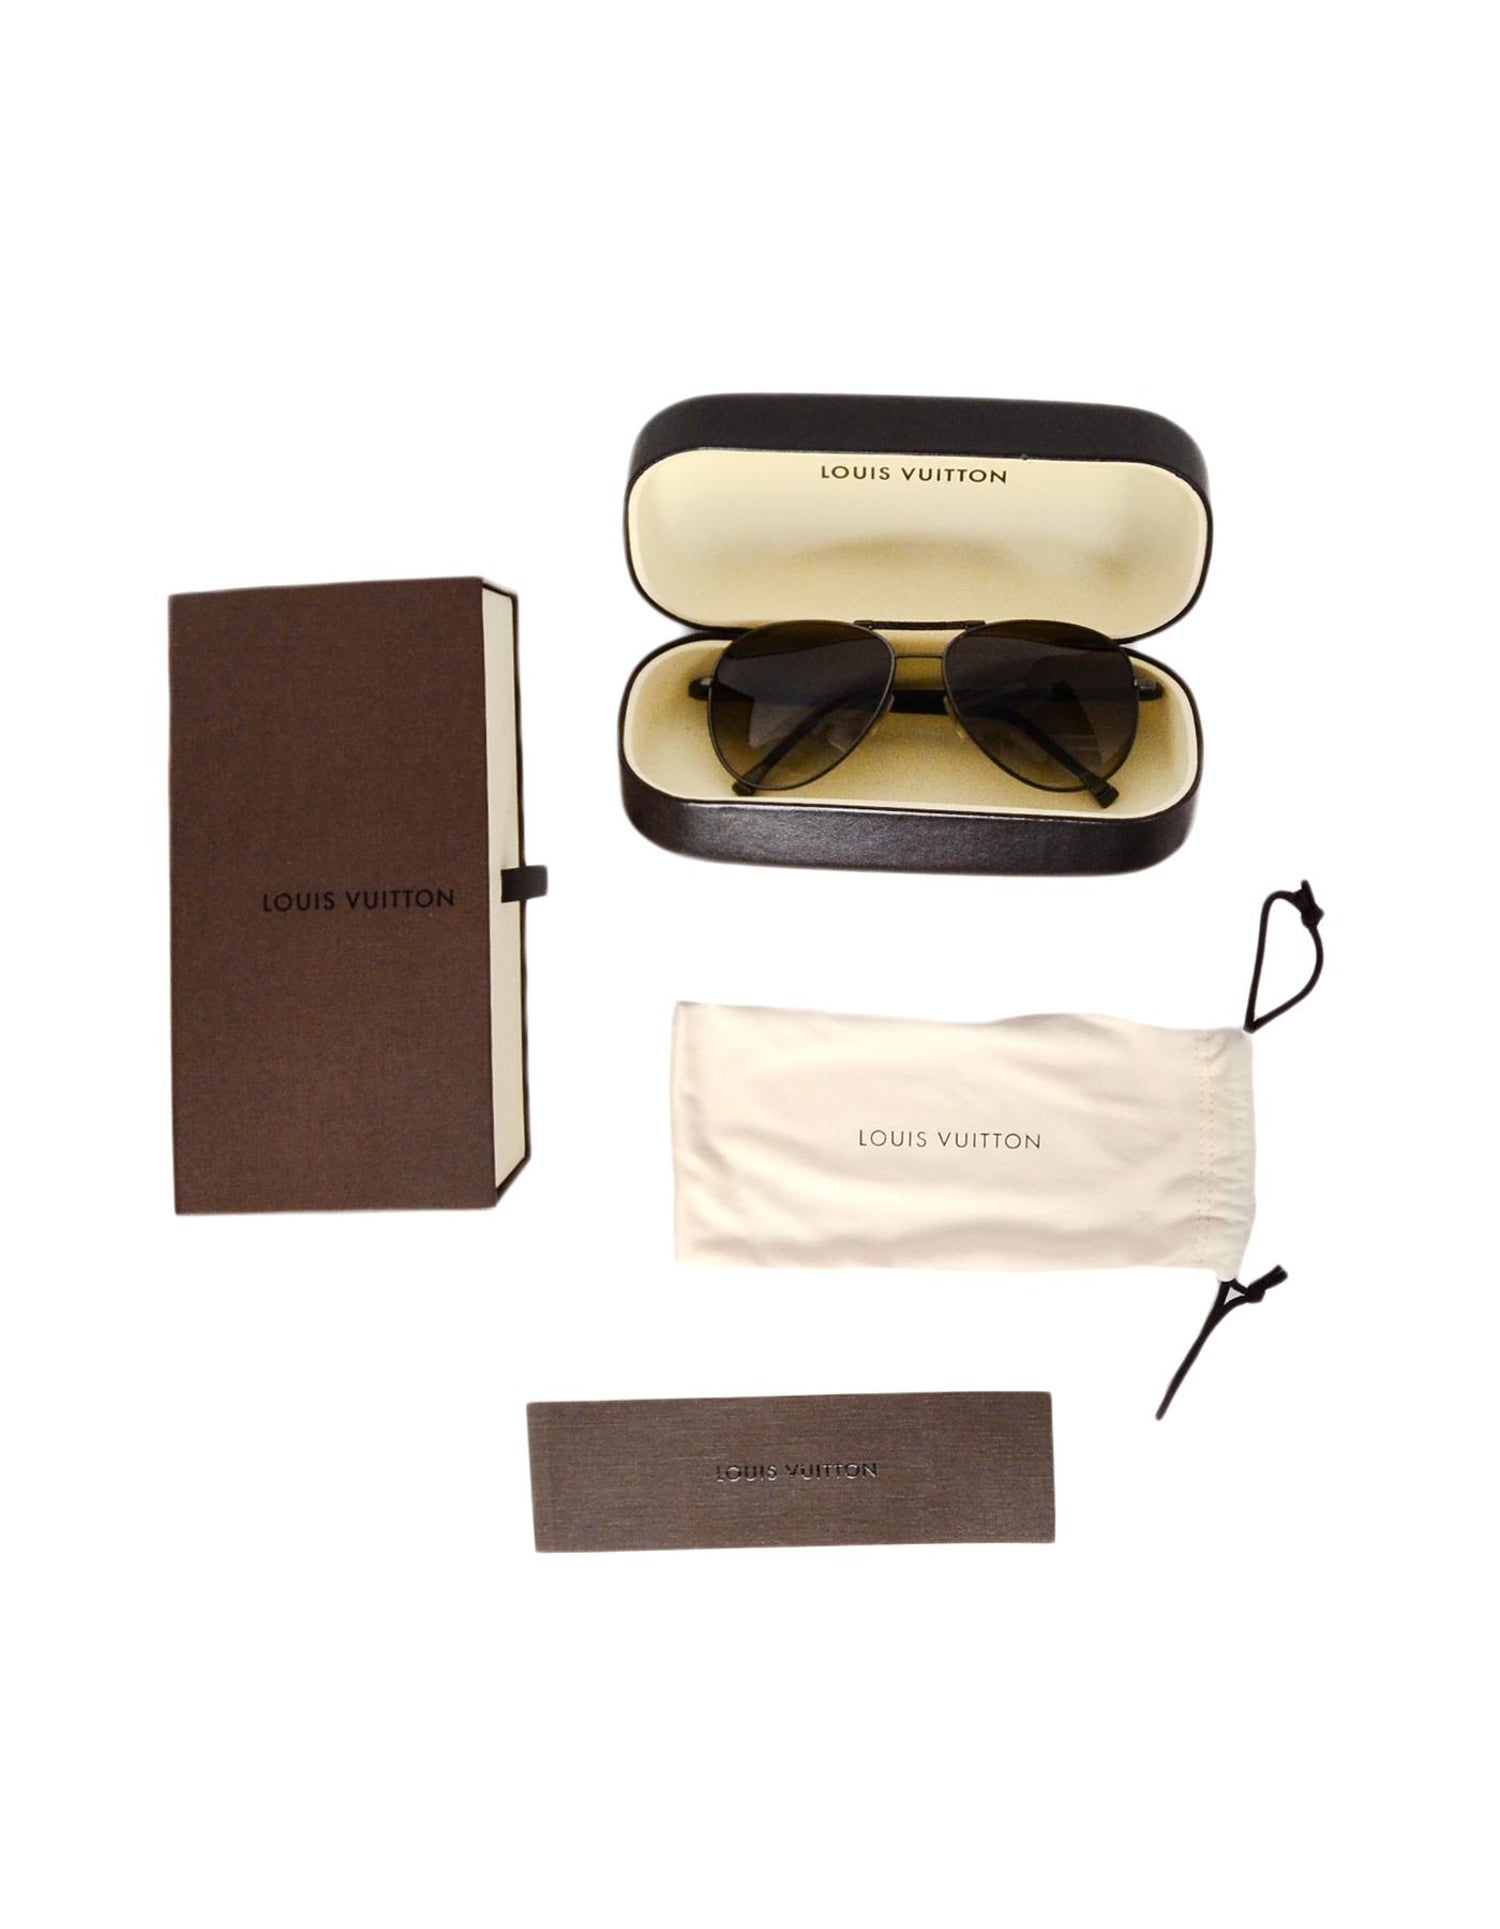 a6add7db1b26 Louis Vuitton Damier Graphite Gunmetal Conspiration Pilote Aviator  Sunglasses For Sale at 1stdibs